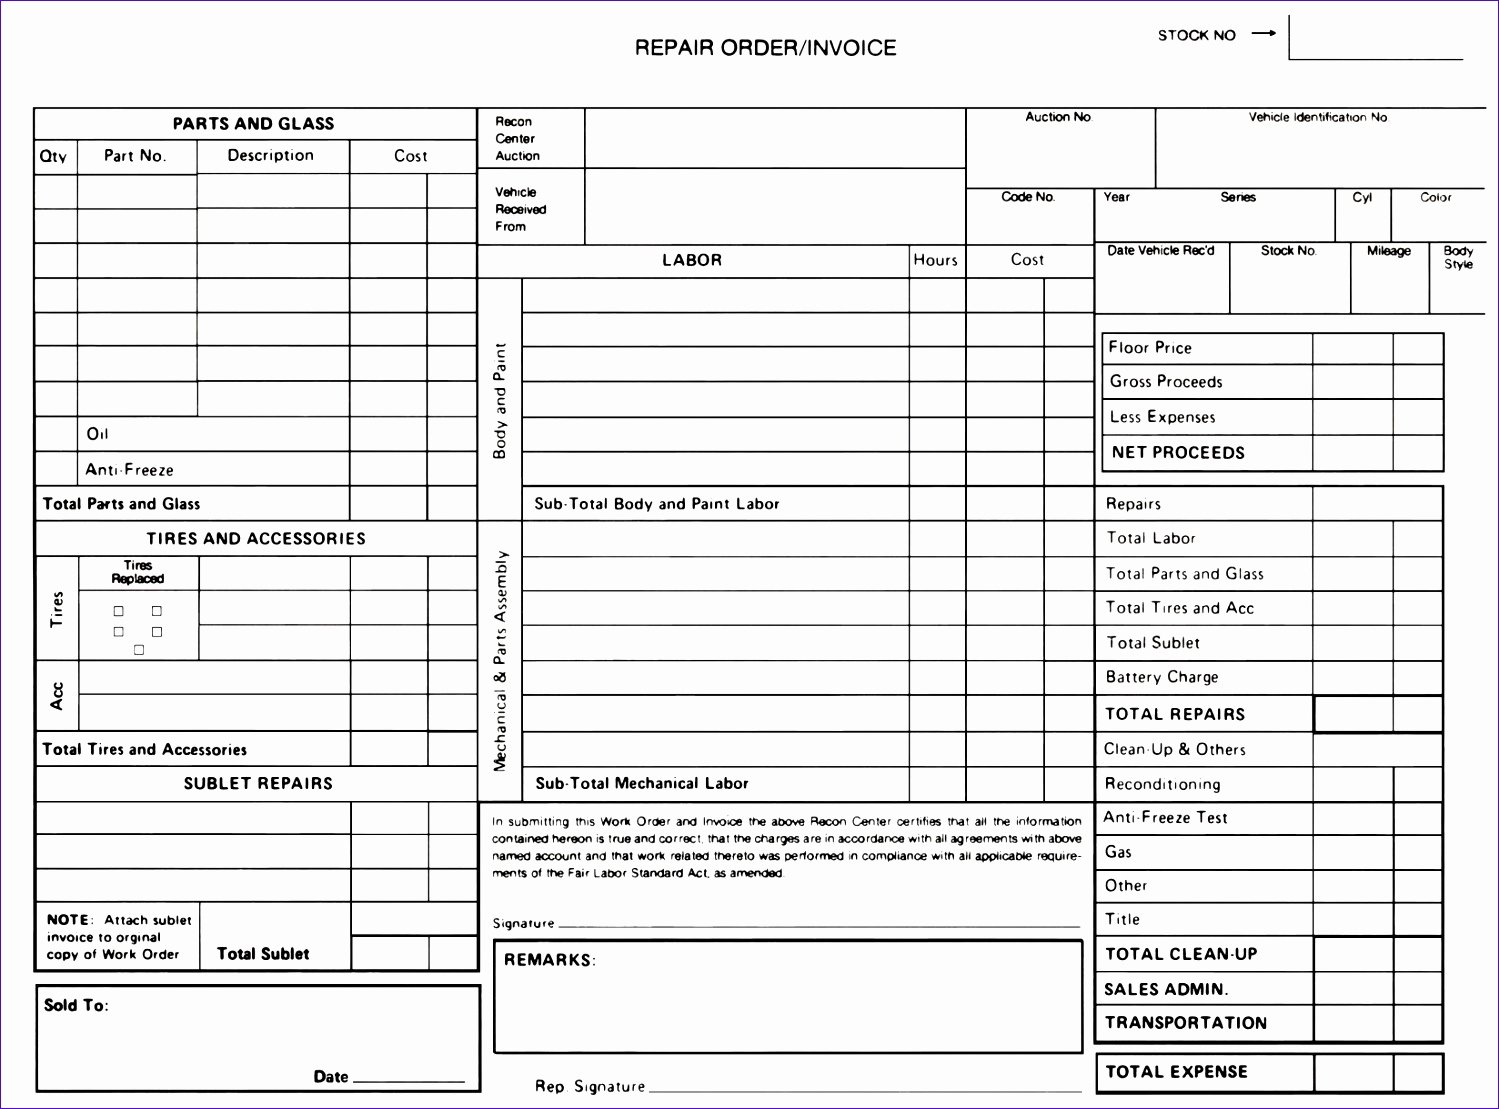 Auto Repair order Template Excel Fresh 6 Auto Repair order Template Excel Exceltemplates